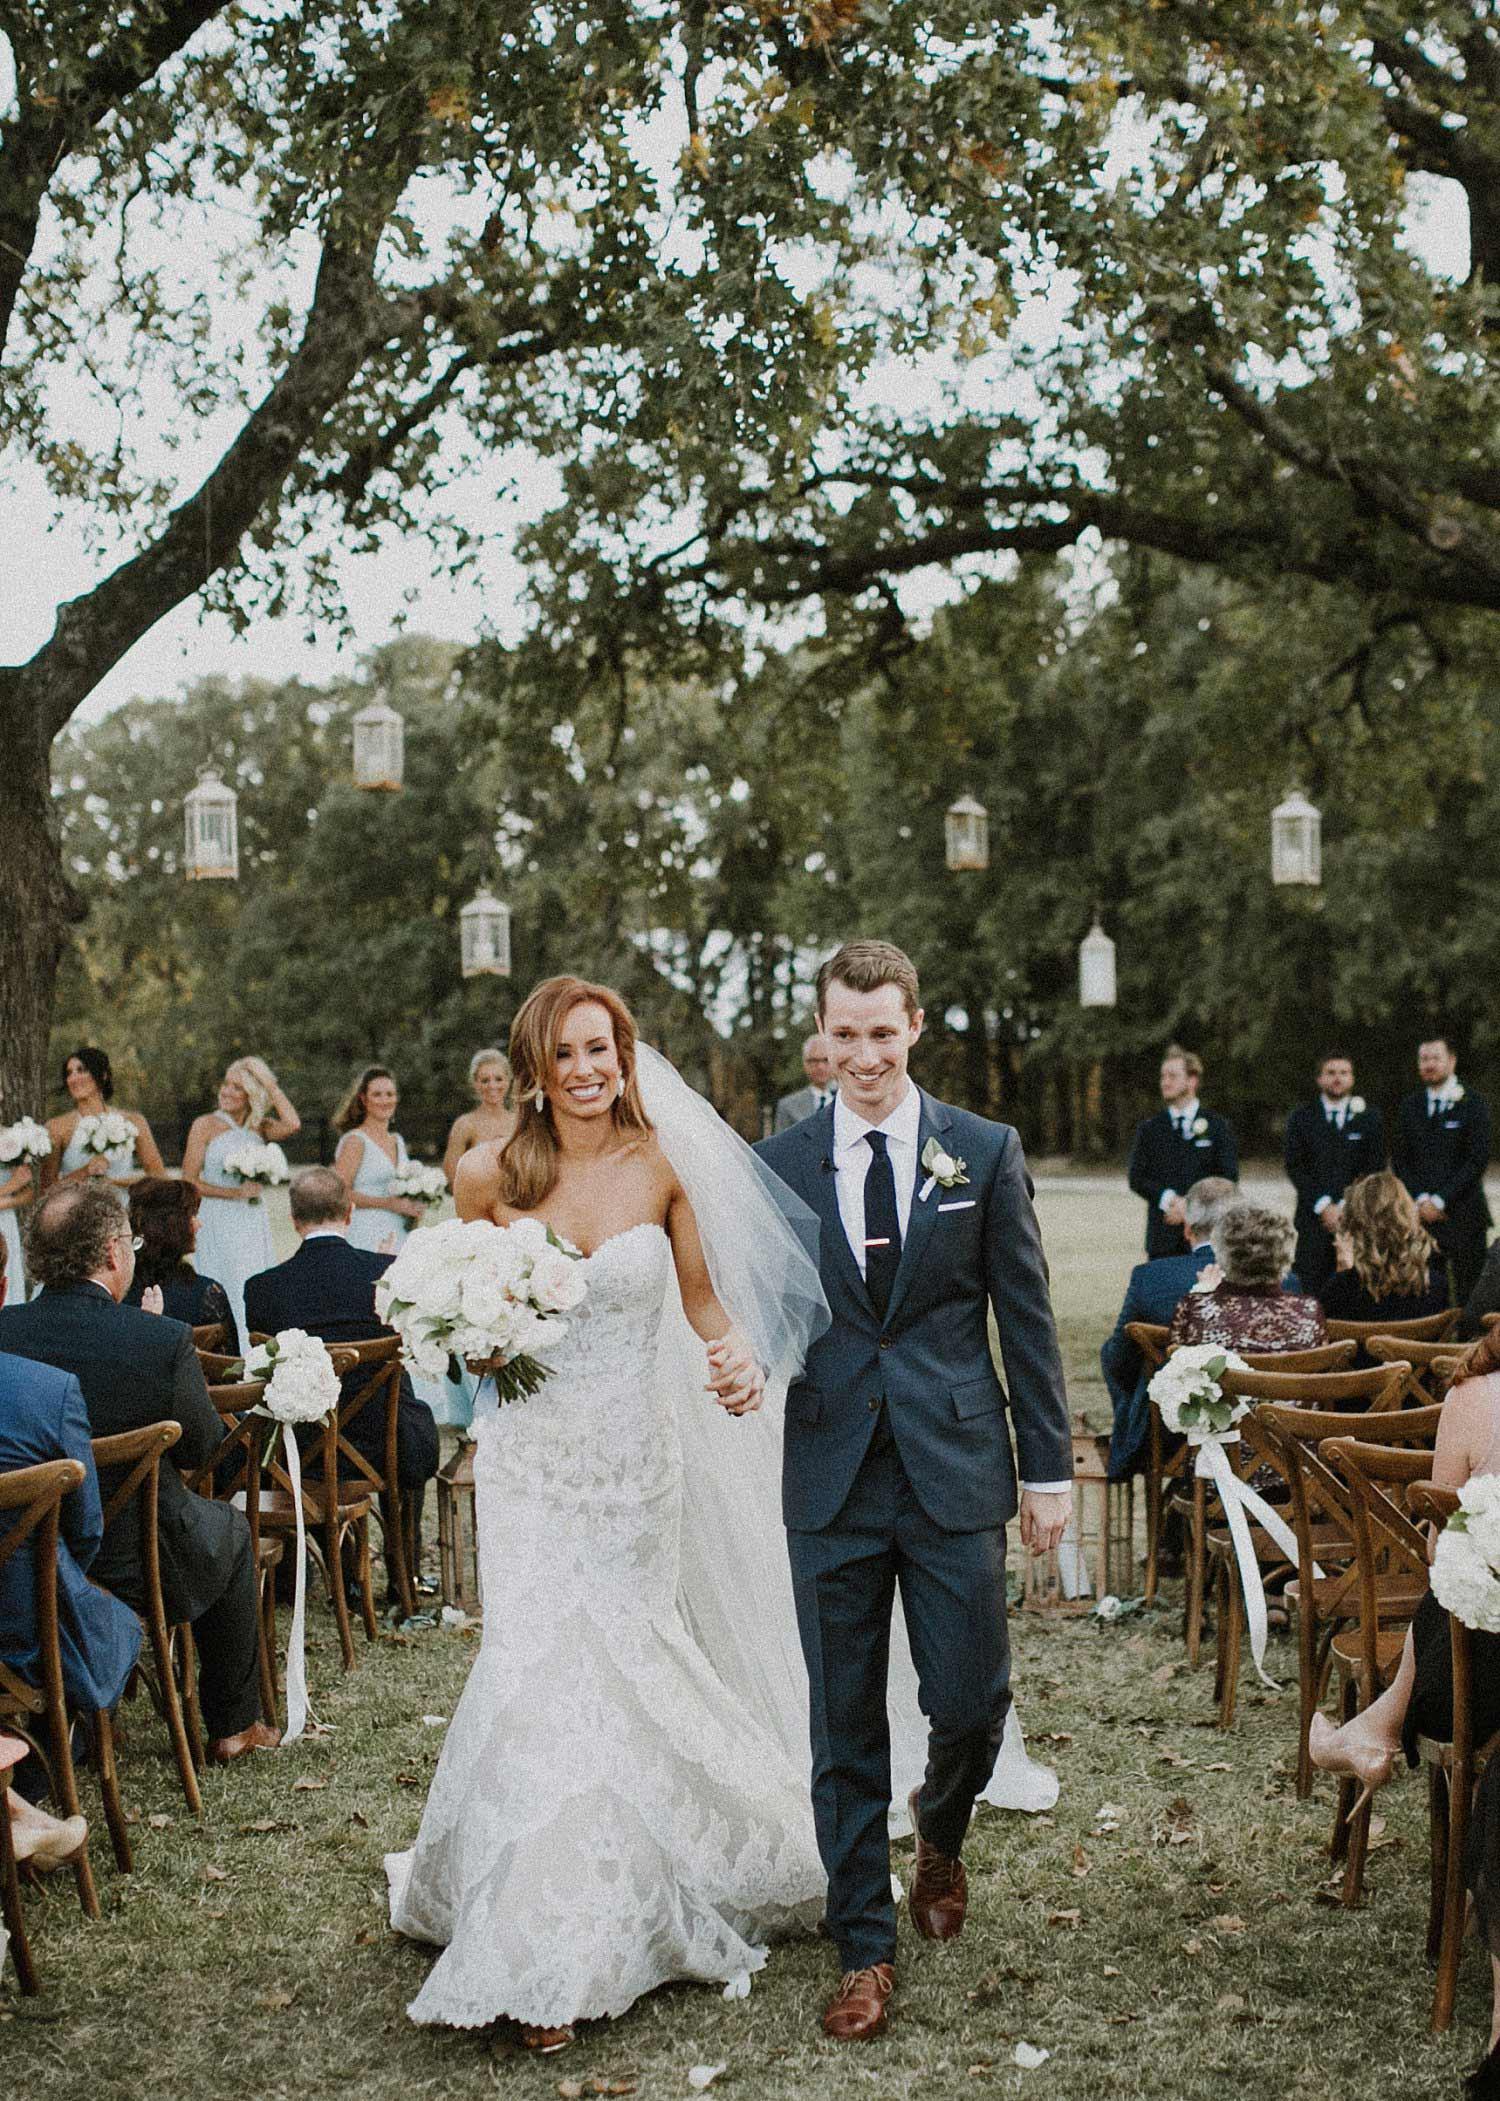 White Sparrow Barn wedding ceremony bride and groom wedding recessional